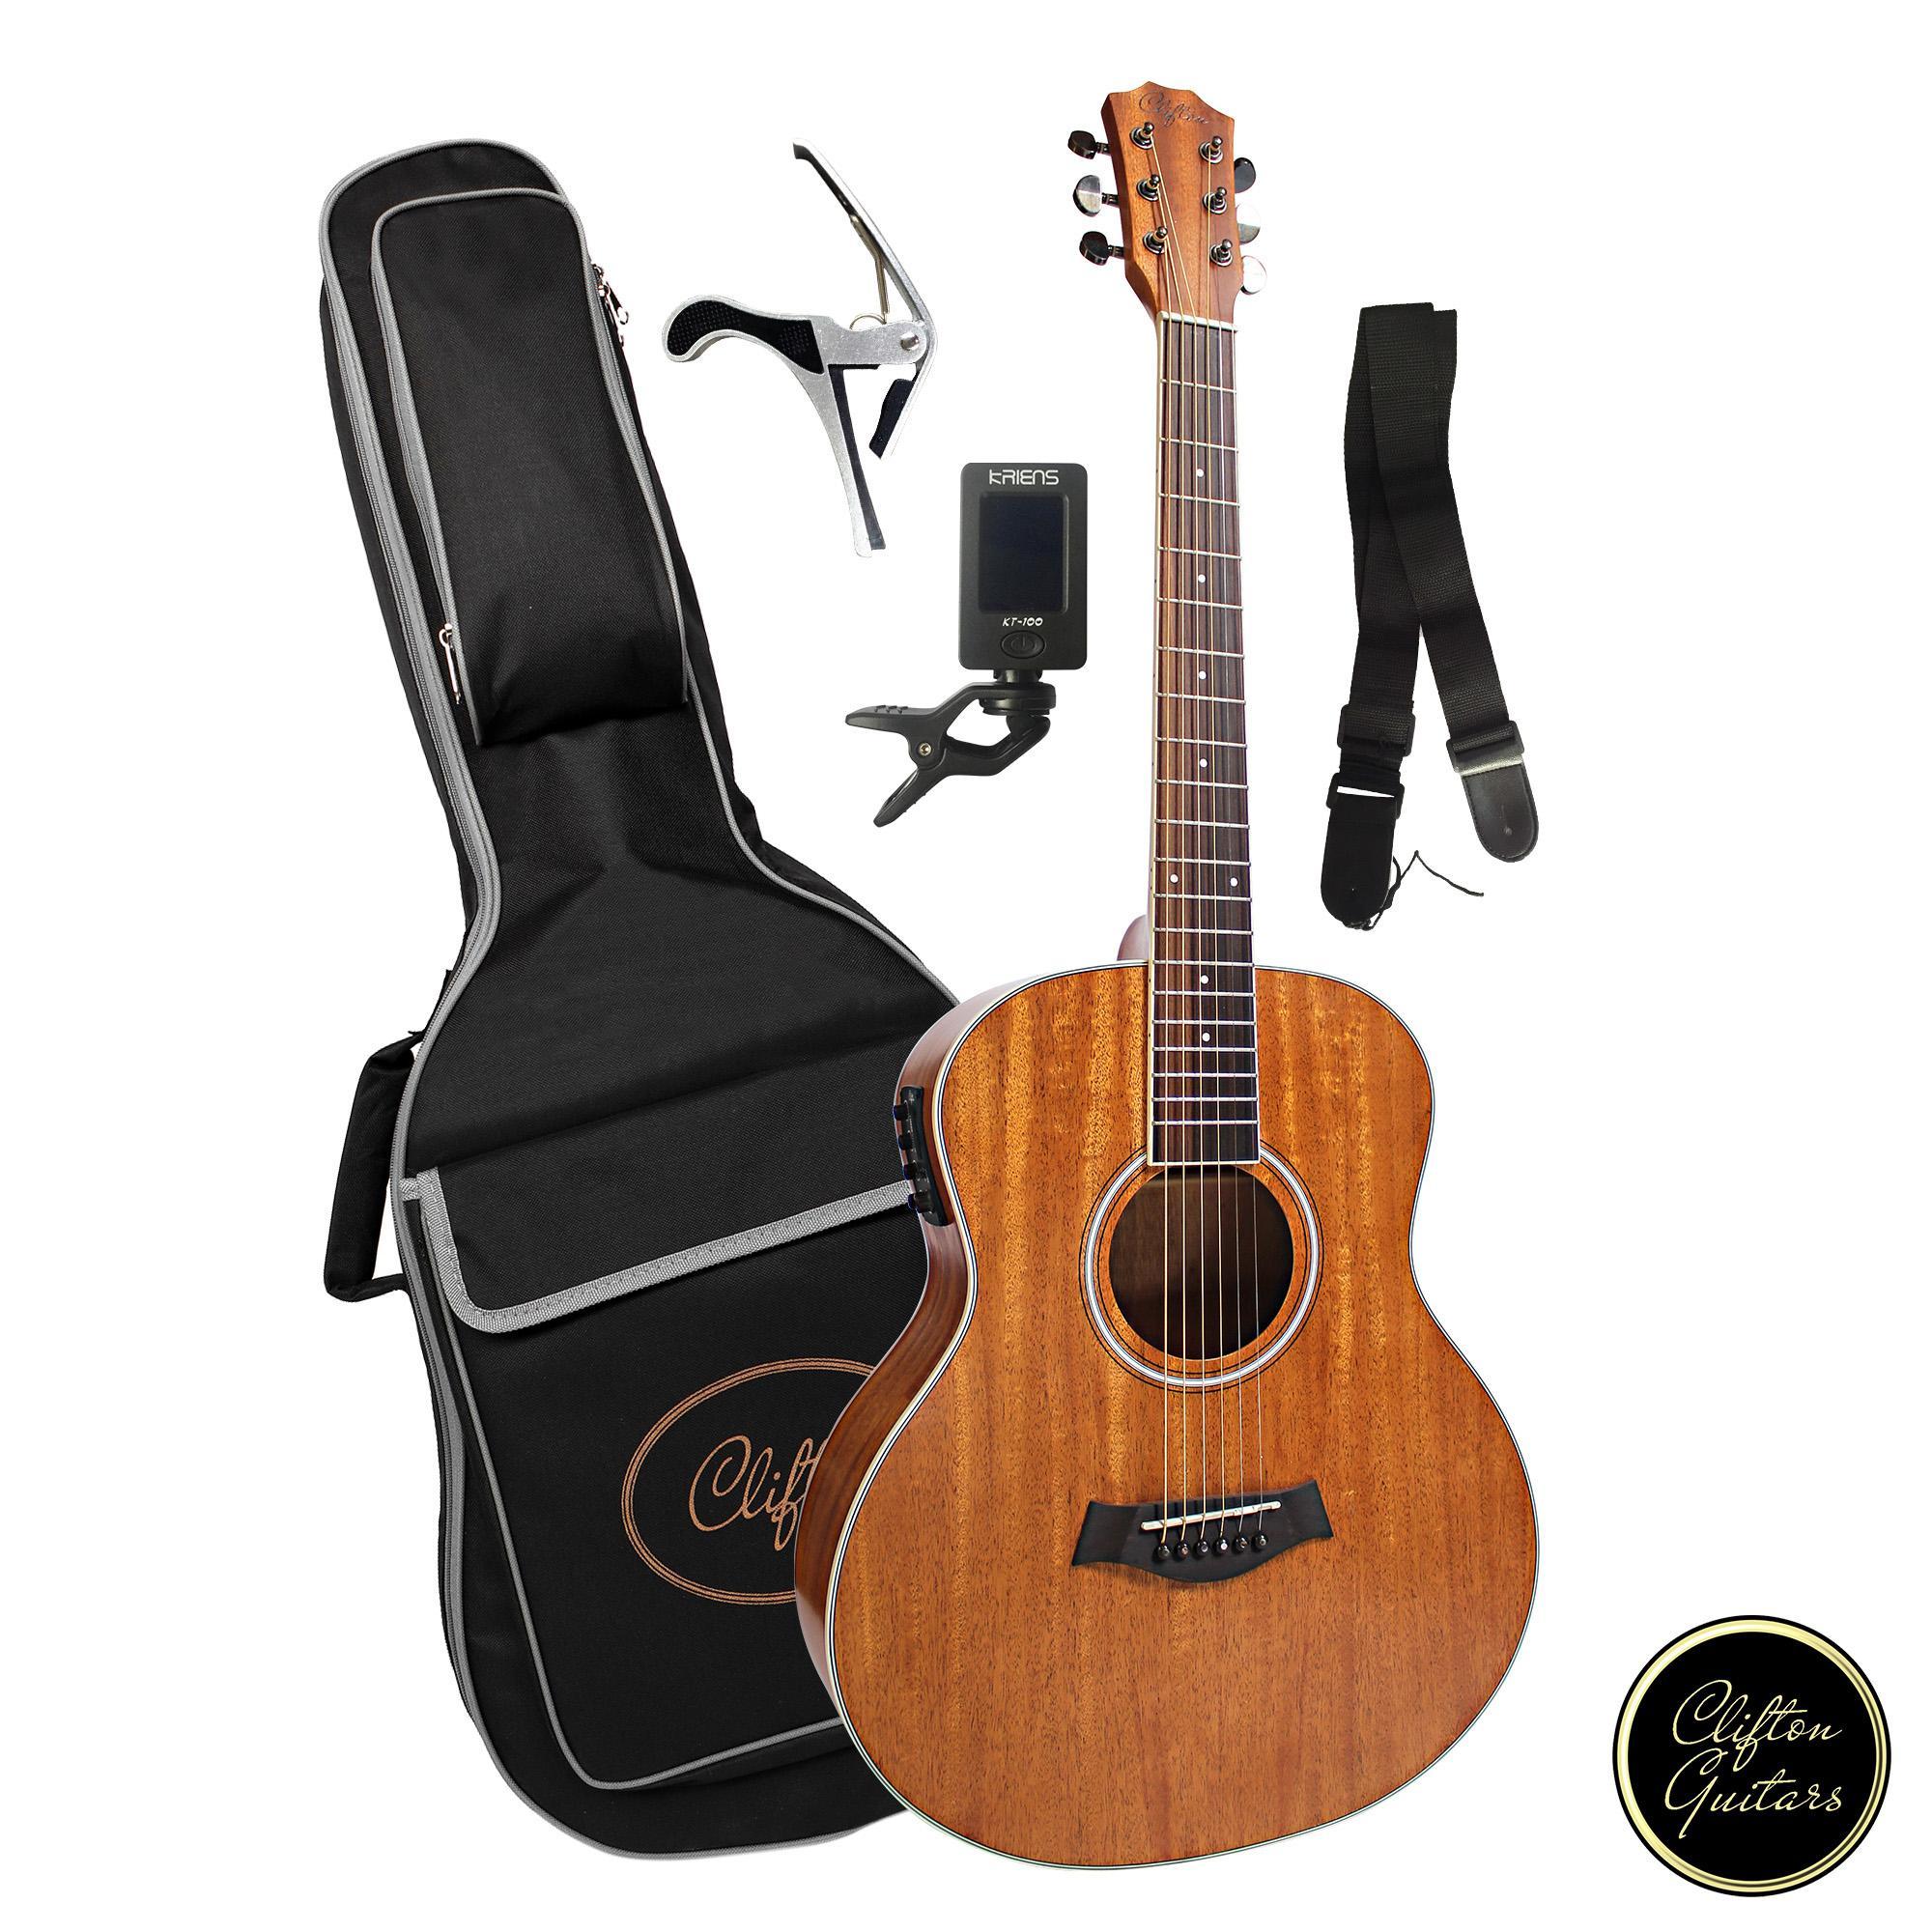 Stringed Instruments Adaptable Hot Guitar Accessories Guitar Wood Guitar Fingerboard Folk Guitar Rose Wood Fingerboard